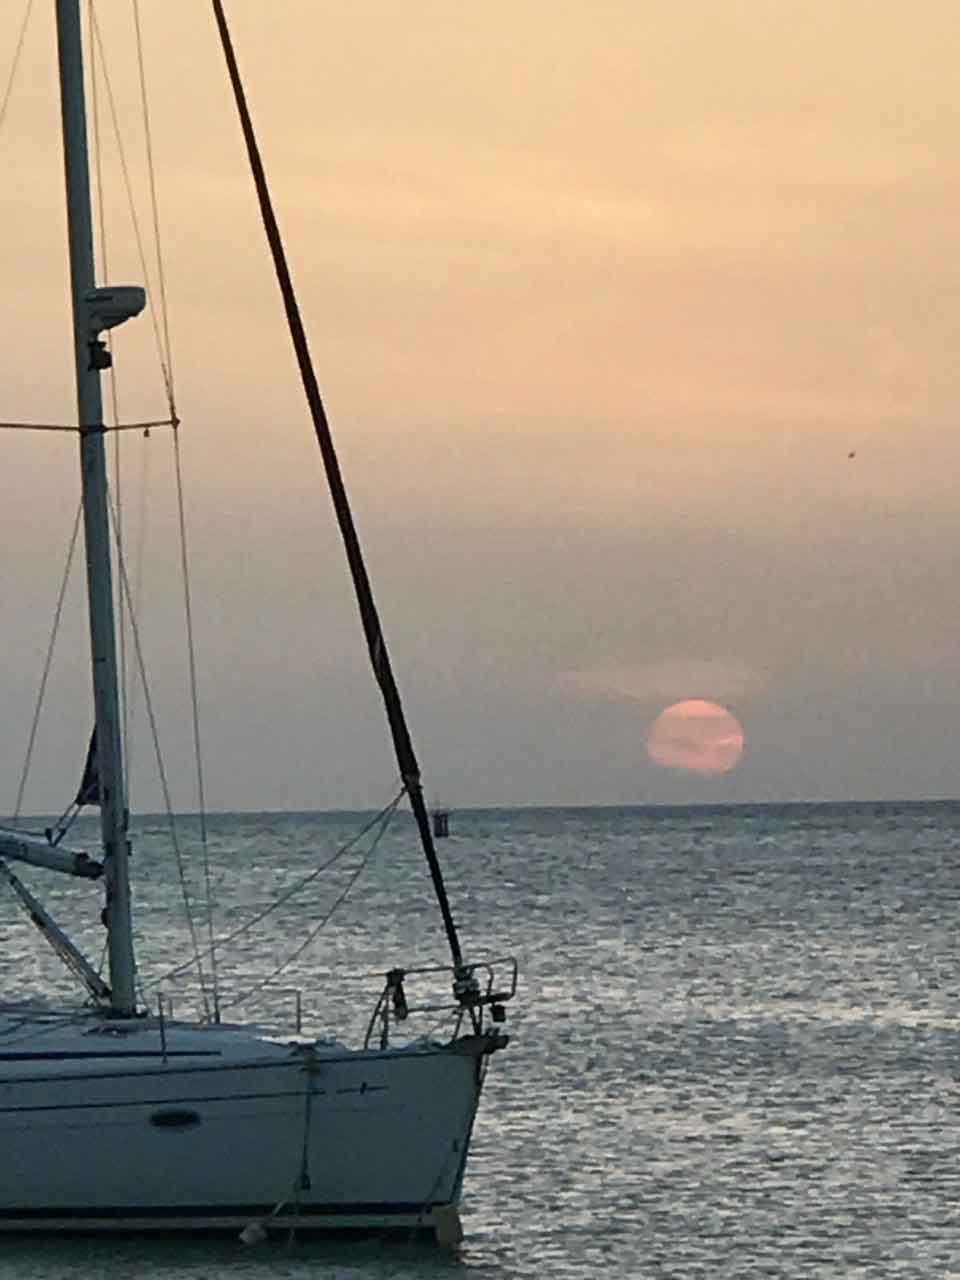 Vakantiewoning Aruba zonsondergang Barefoots - OMGEVING